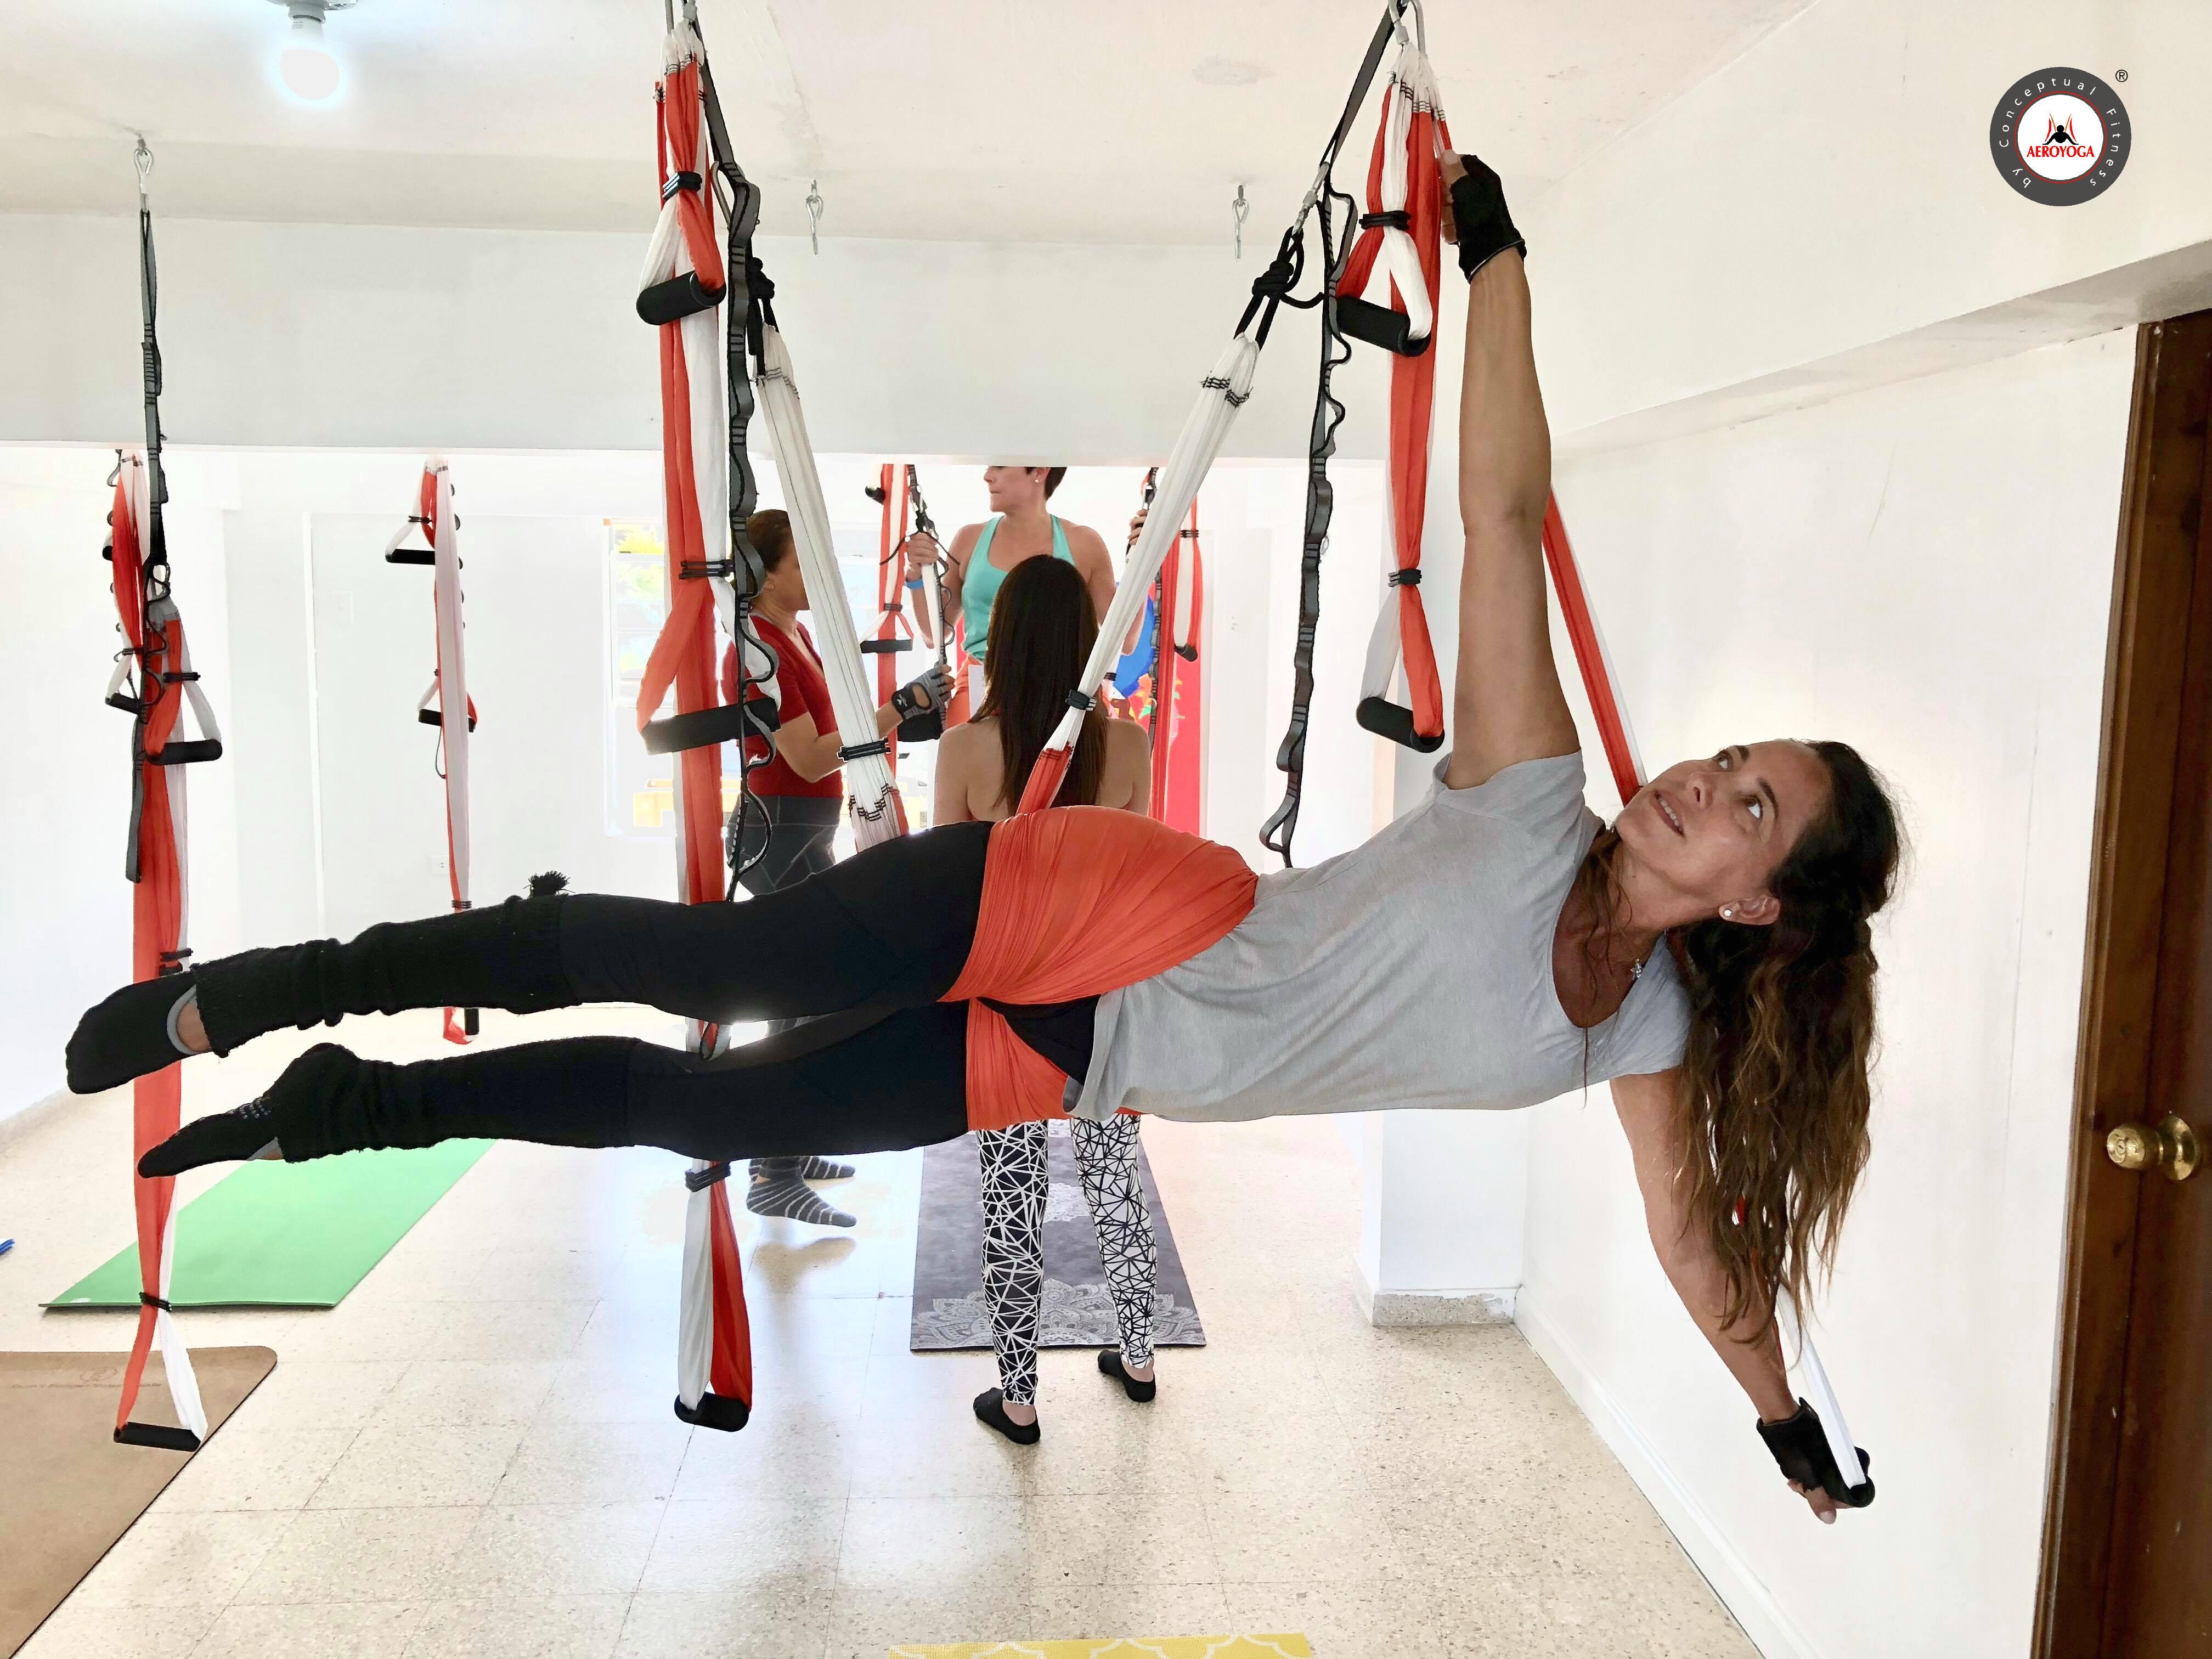 Aerial Yoga Teacher Training Puerto Rico, Terminó un Nuevo Curso AeroYoga ®!